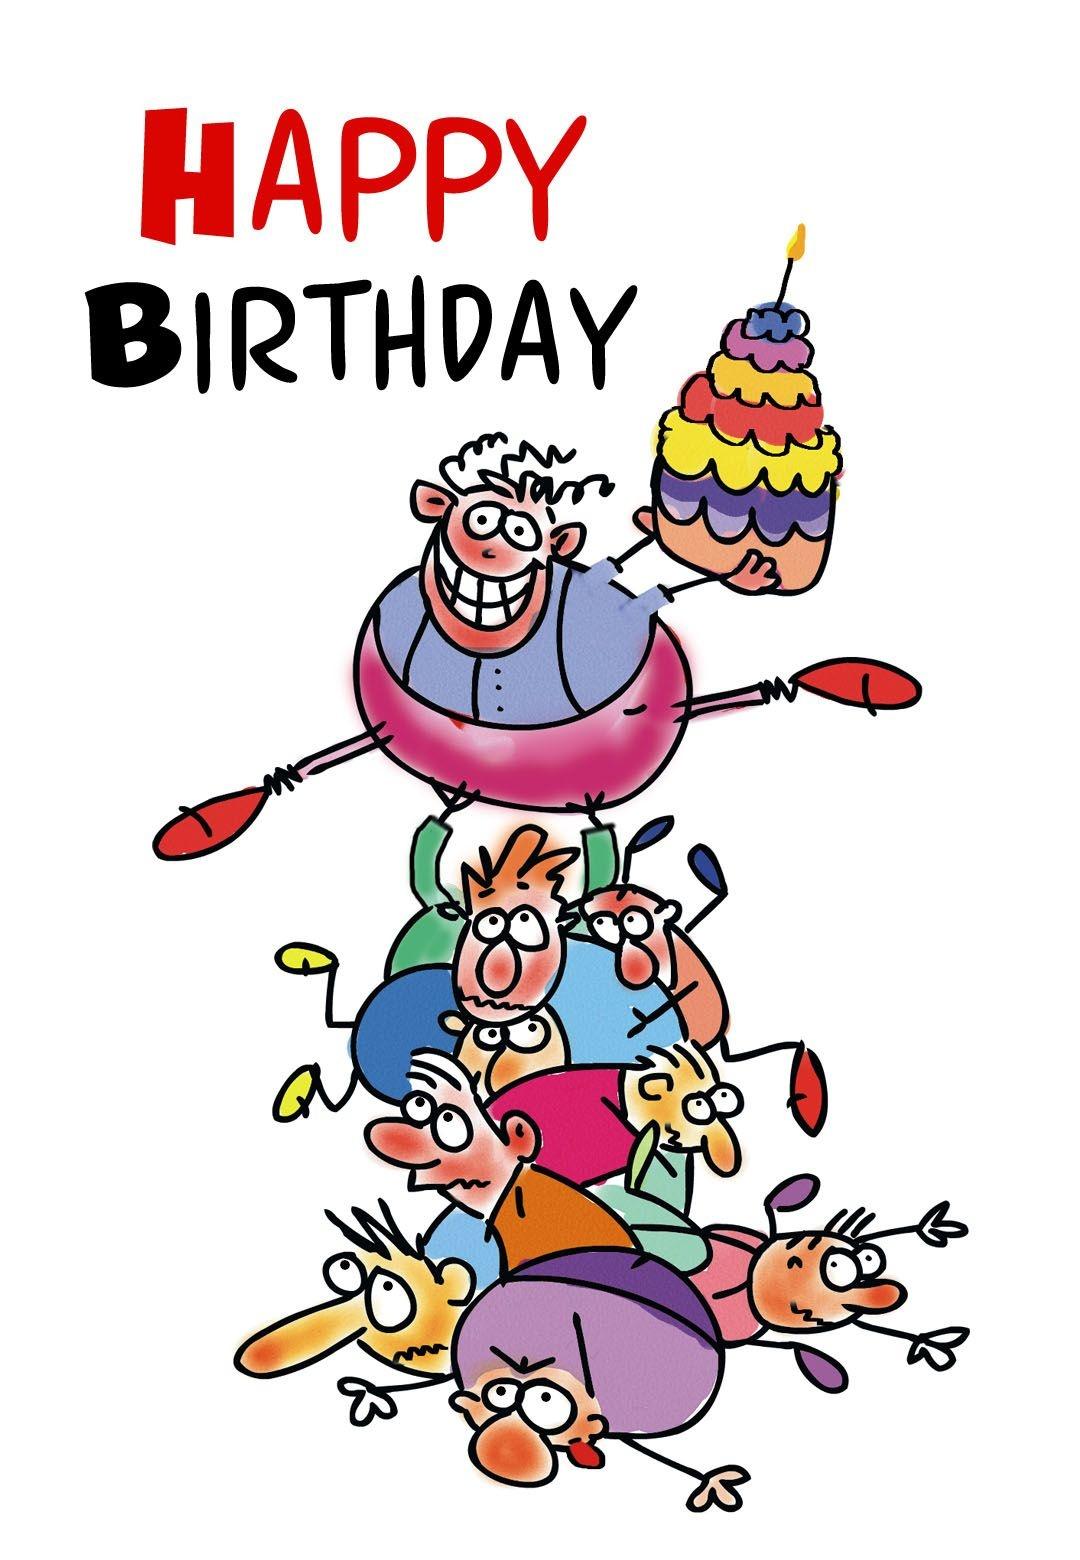 Free Printable Funny Birthday Greeting Card | Gifts To Make | Free - Free Printable Funny Birthday Cards